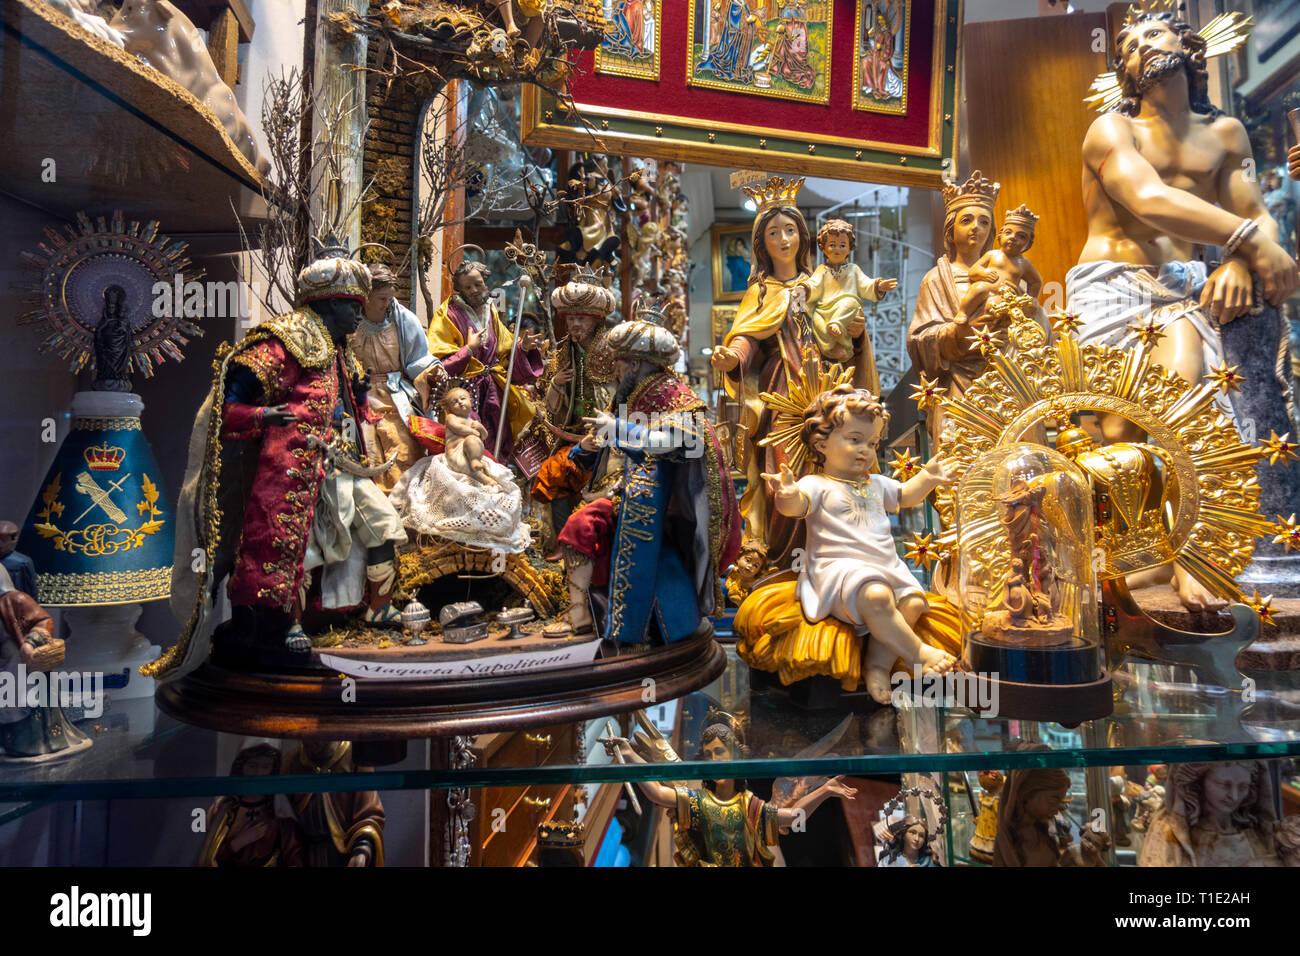 Madrid shop Articulos Religiosos El Angel. Religious articles store, window display with Nativity scenes; baby Jesus and Catholic figurines. - Stock Image